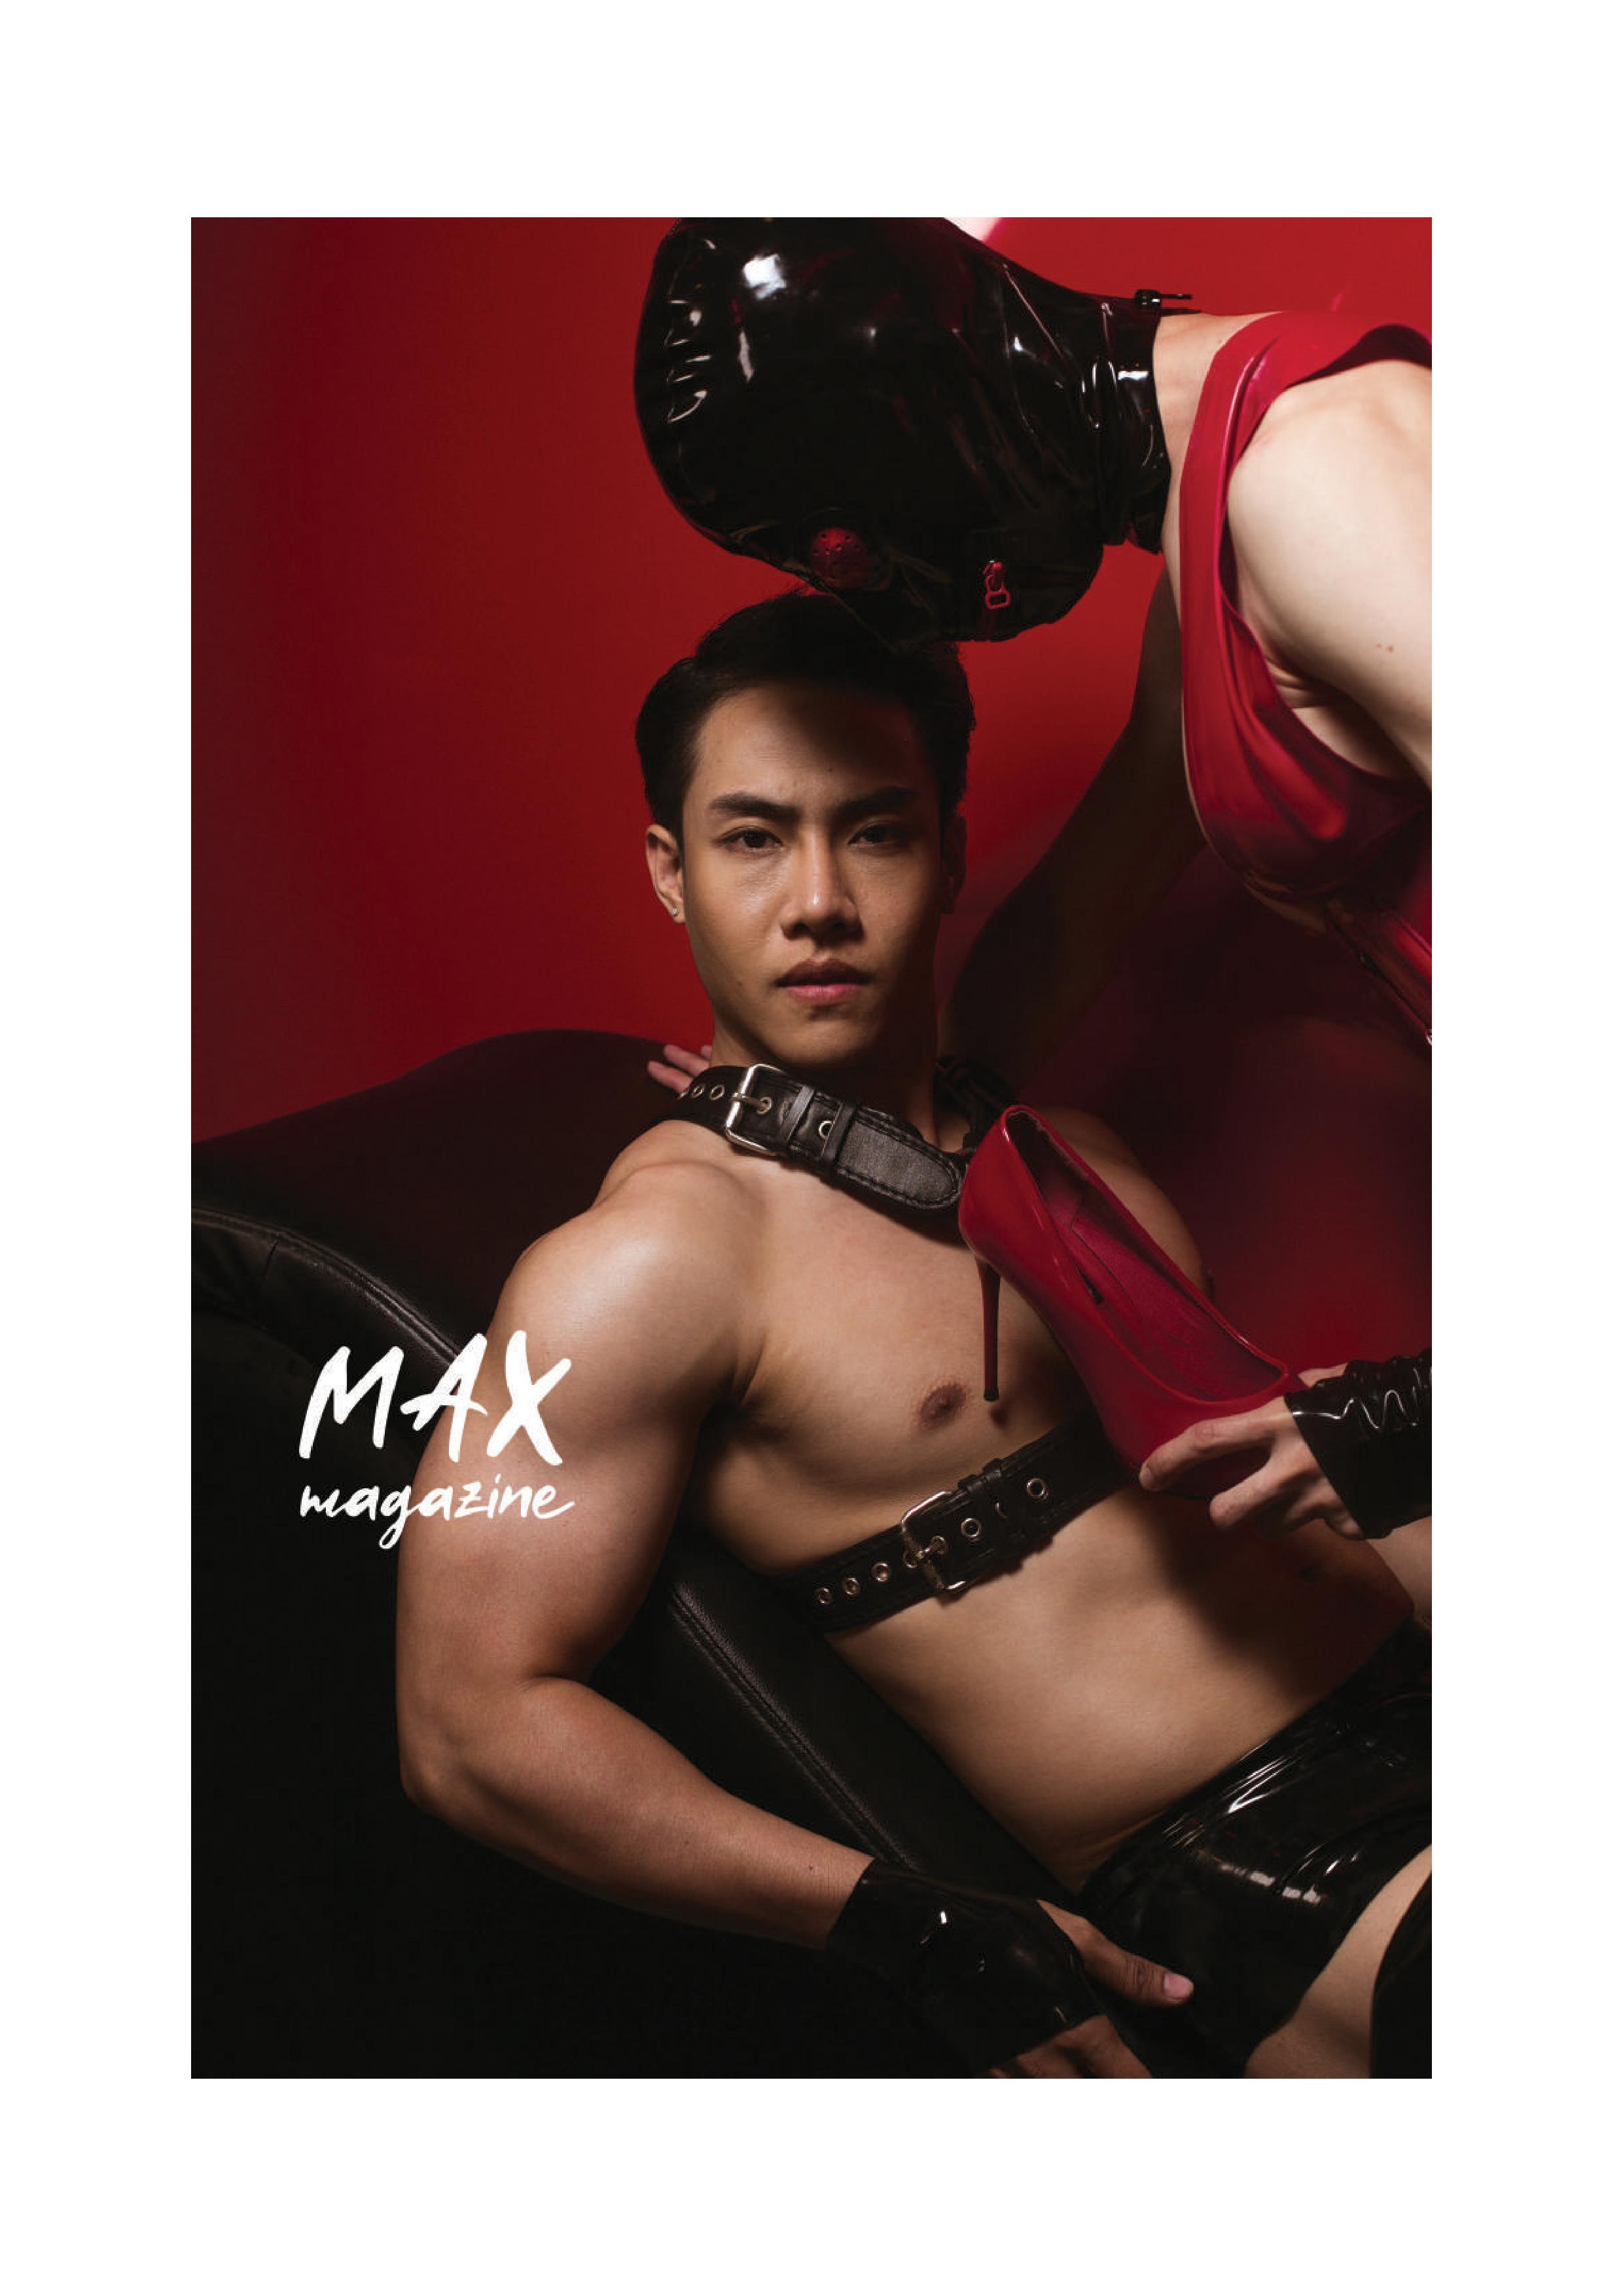 MAX 01 | Hack Sathaporn, tra tấn, bú trai thẳng (Non-sex)